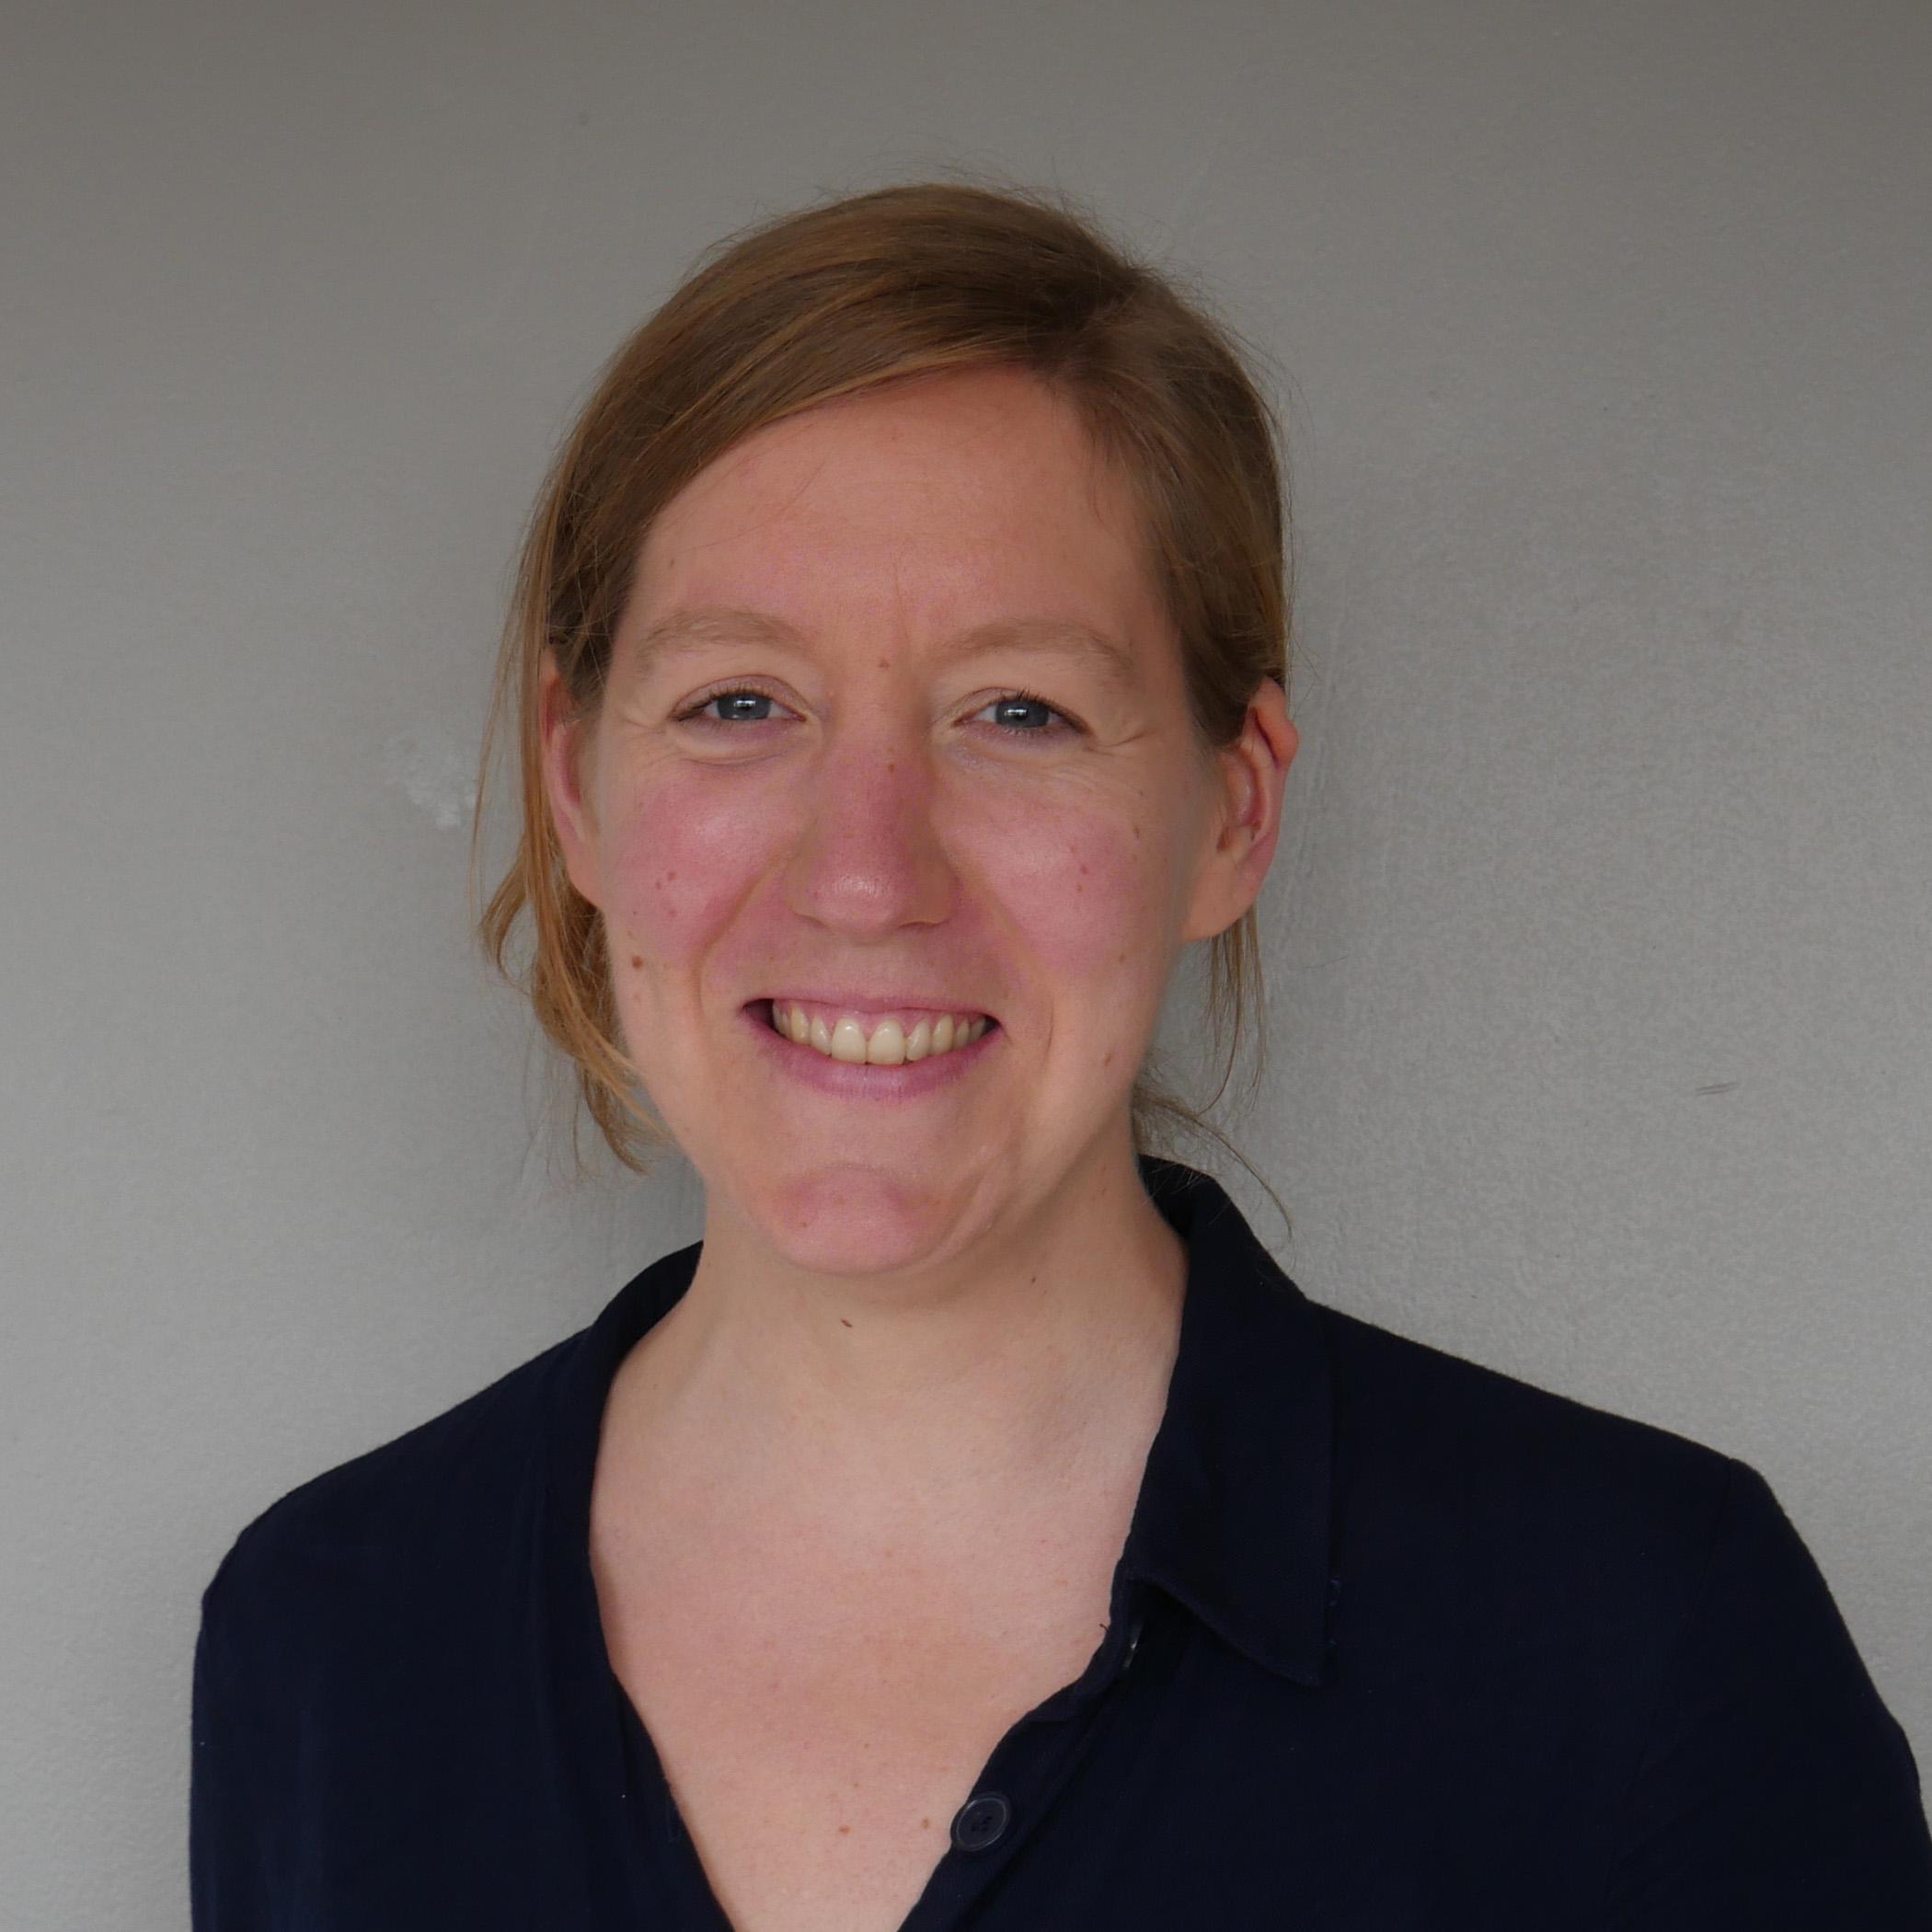 Dr. Lizanne Schweren